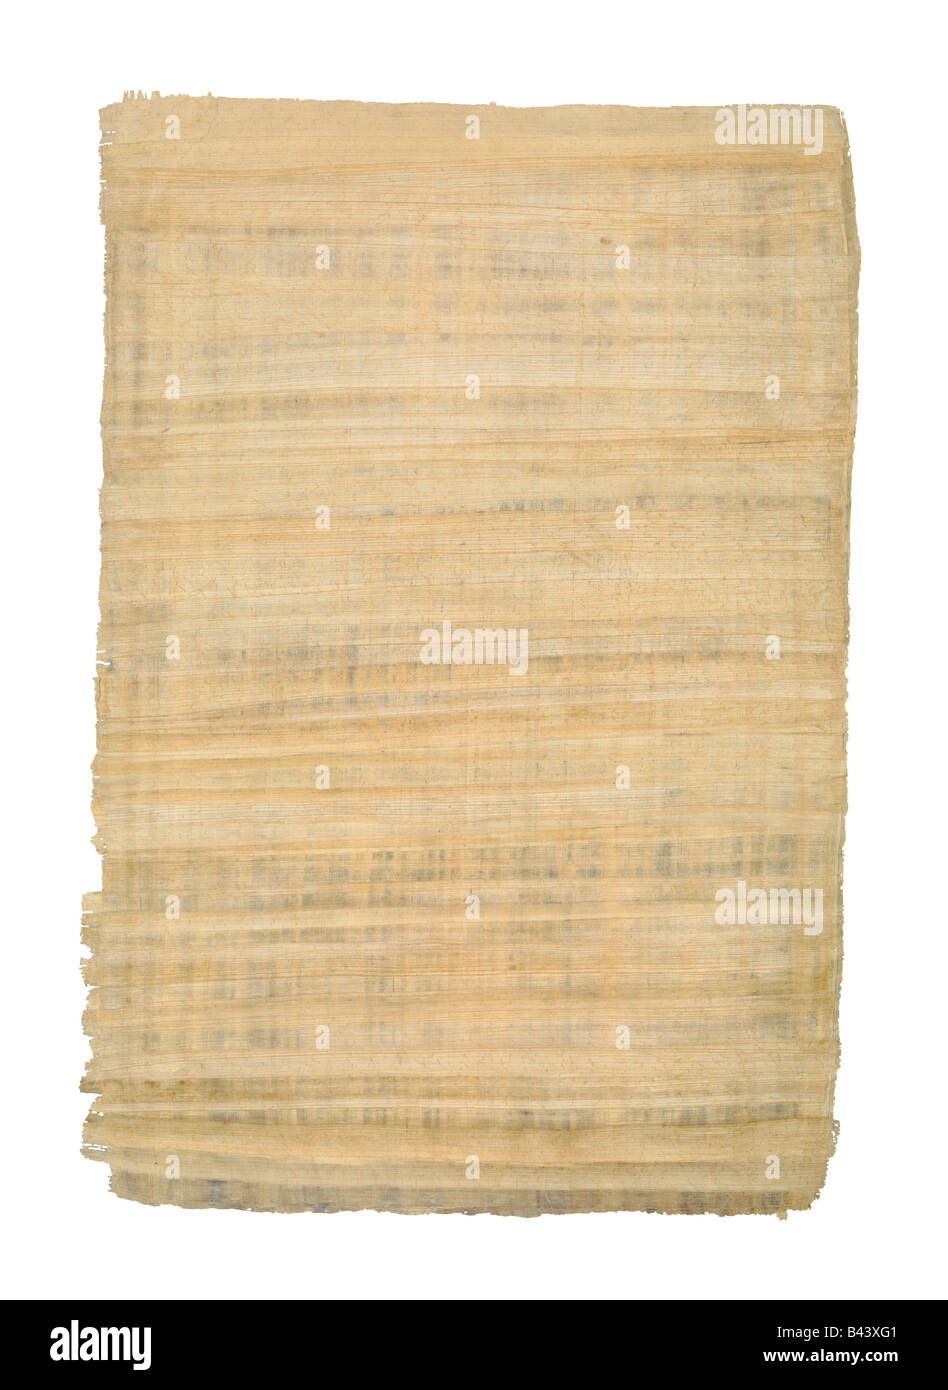 egyptian papyrus paper - photo #38